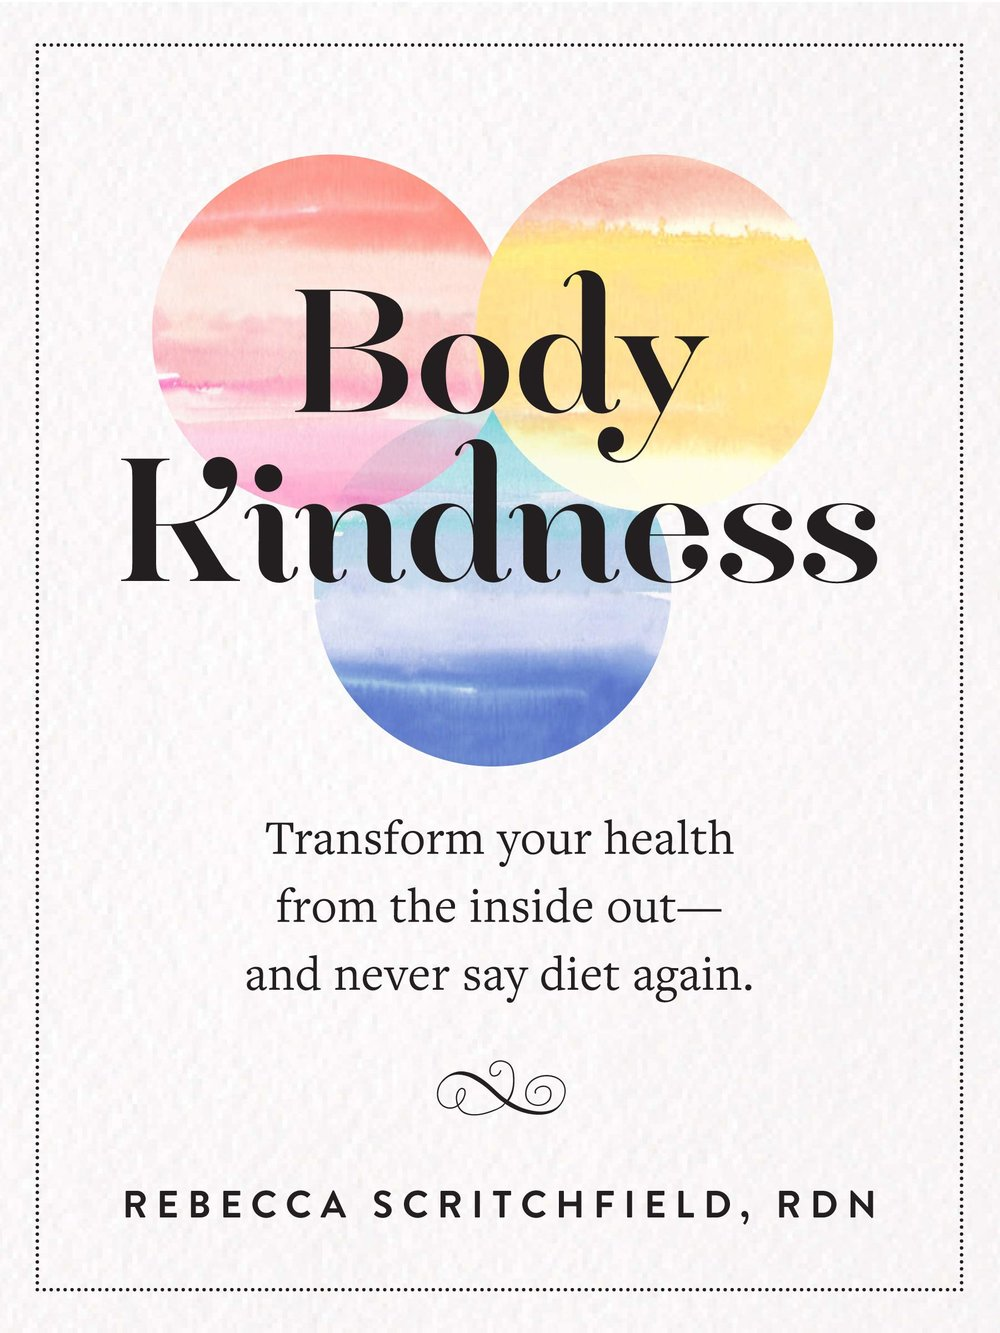 body kindness.jpg